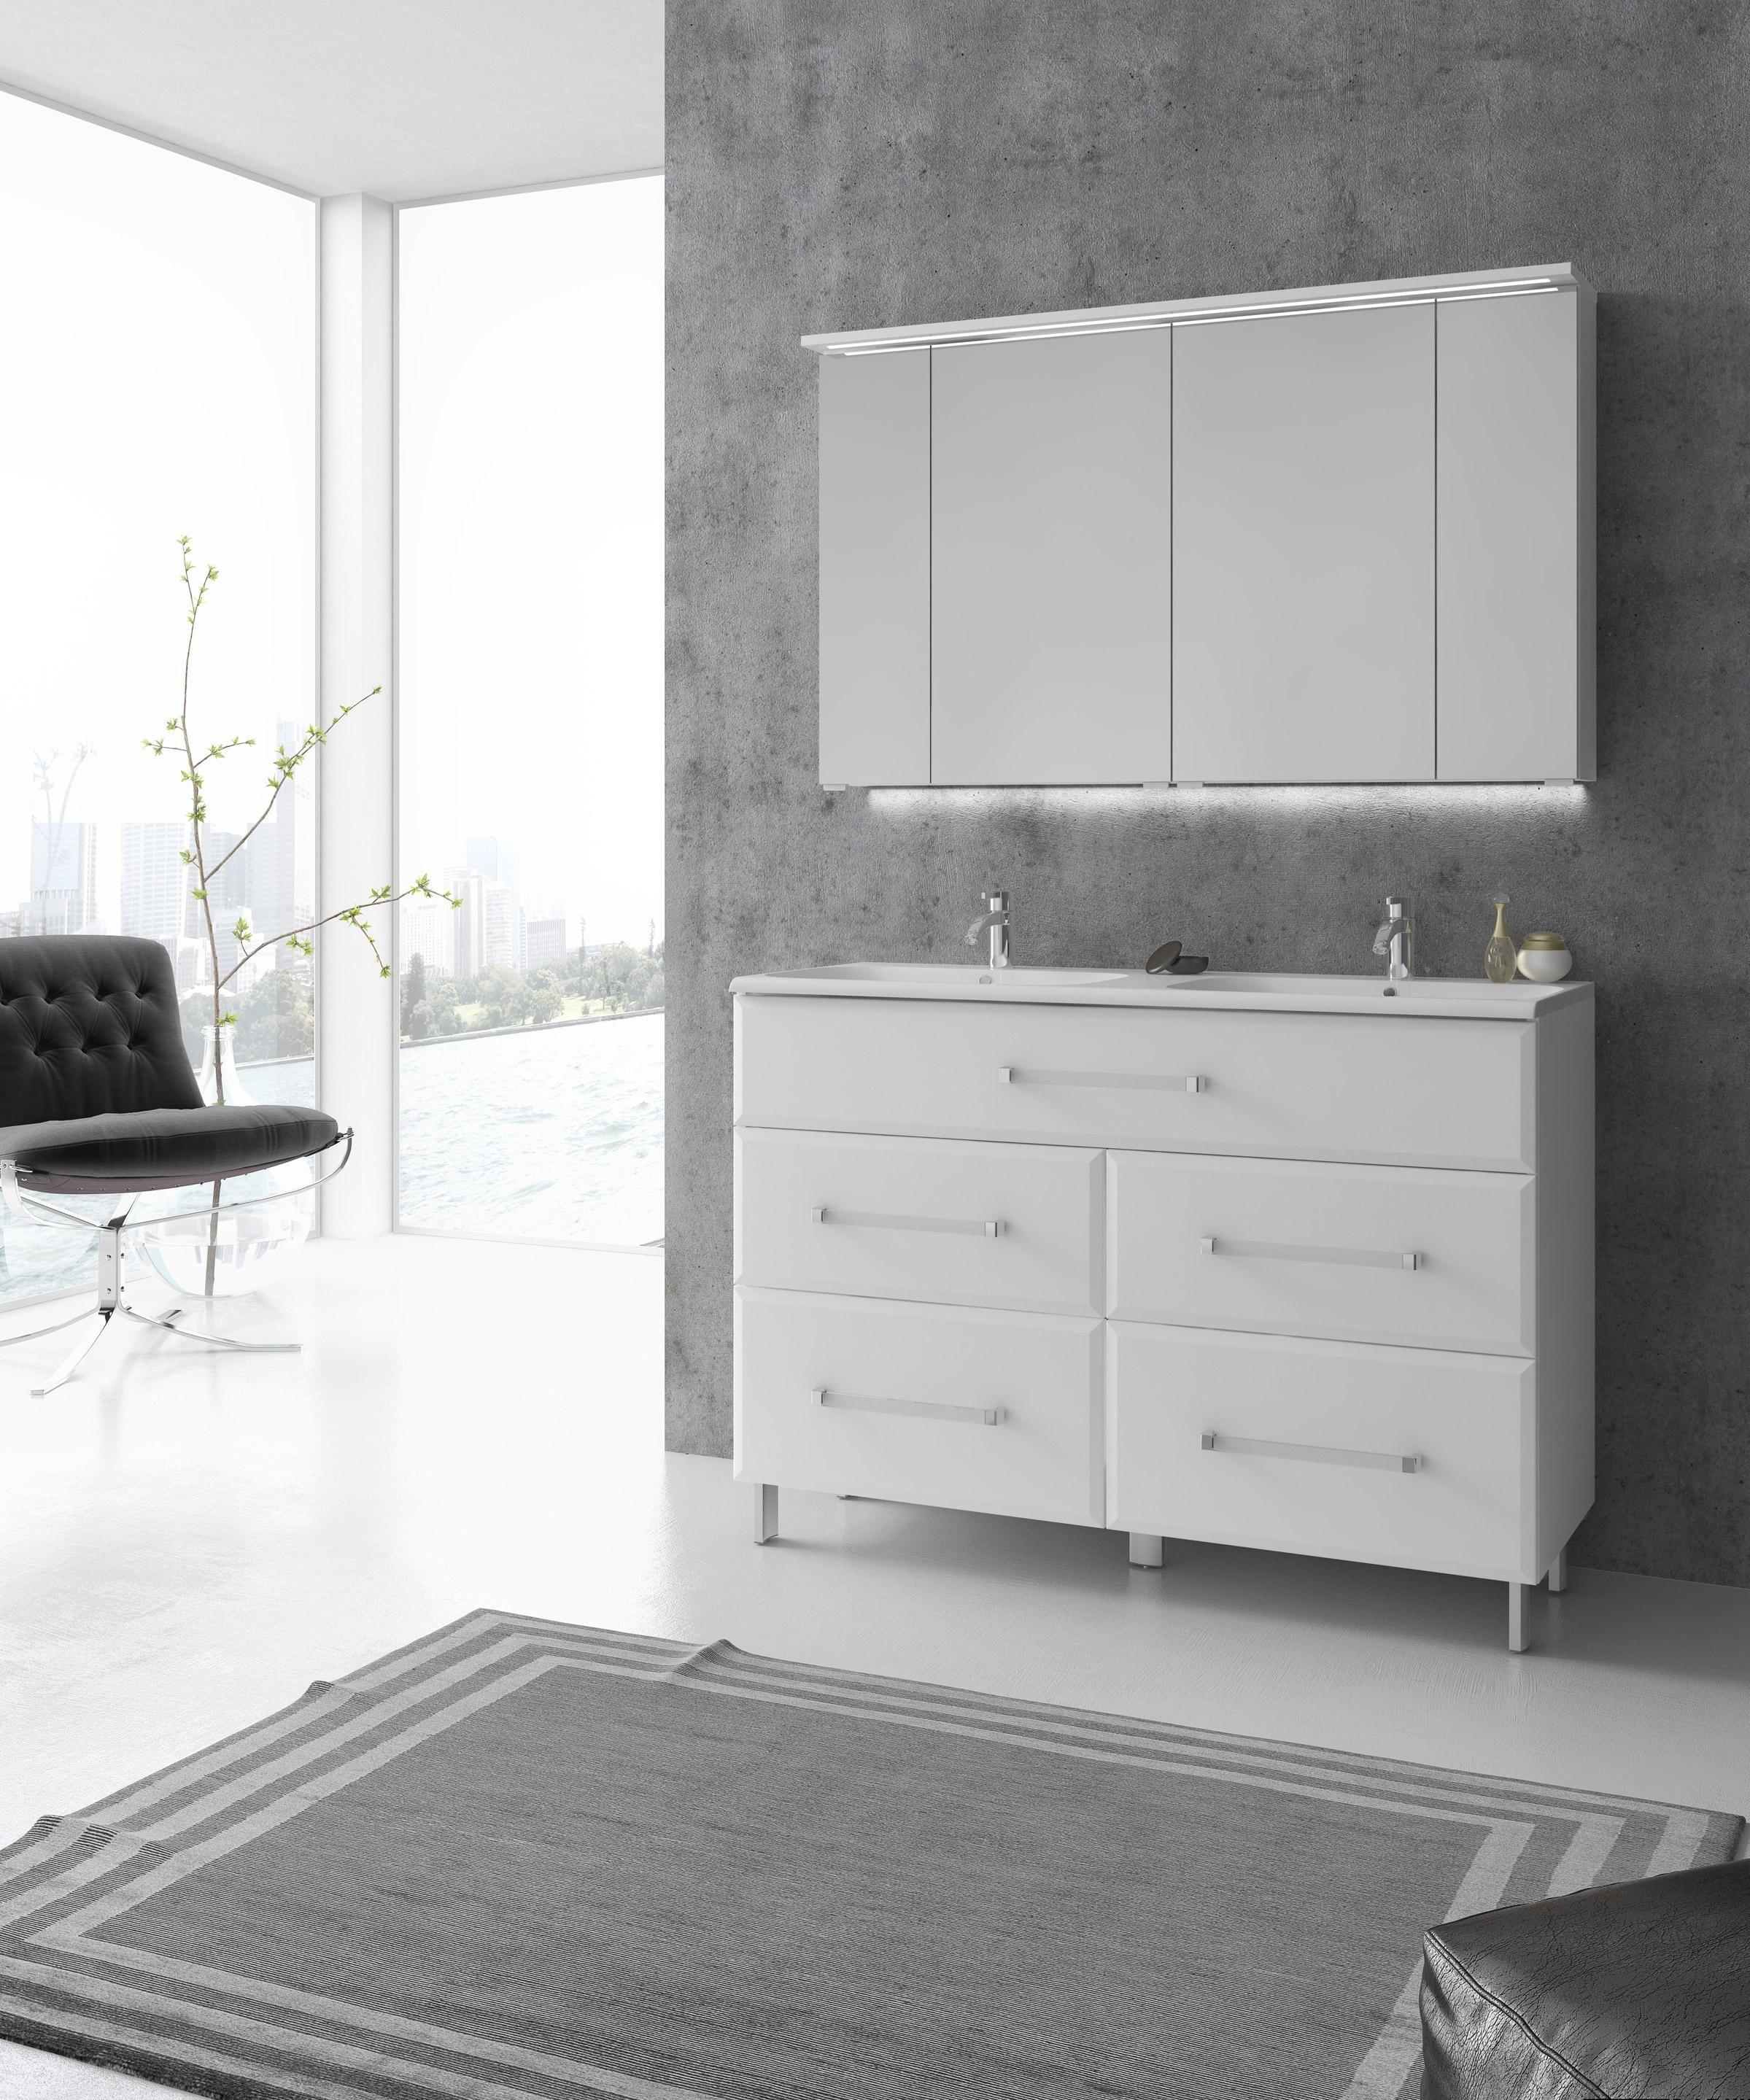 Meuble Simple Vasque L 120 X H 84 X P 45 2 Cm Blanc Opale Meuble Salle De Bain Leroy Merlin Meuble Simple Et Meuble Salle De Bain